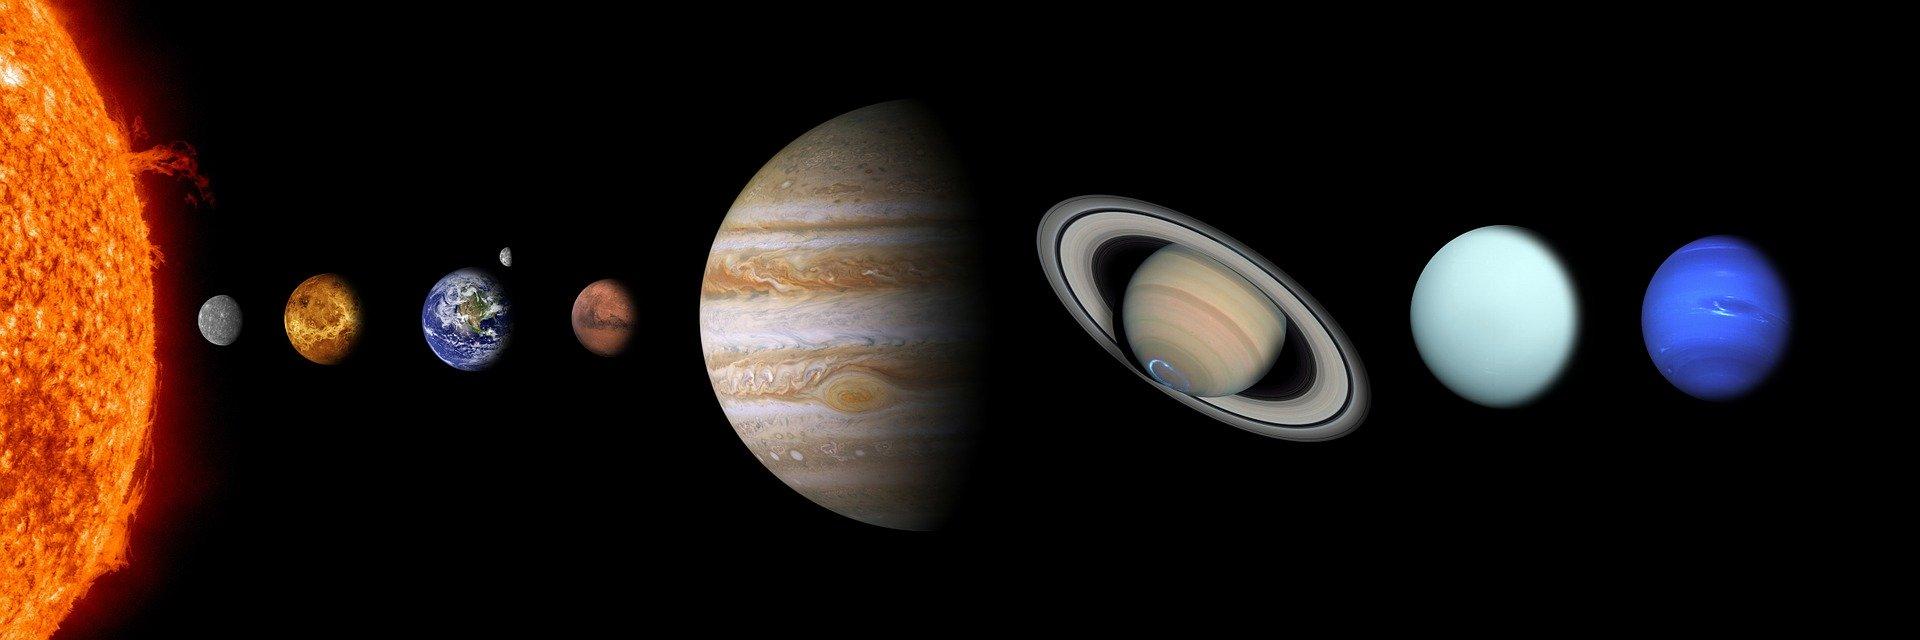 Planetele, interpretare astrologica